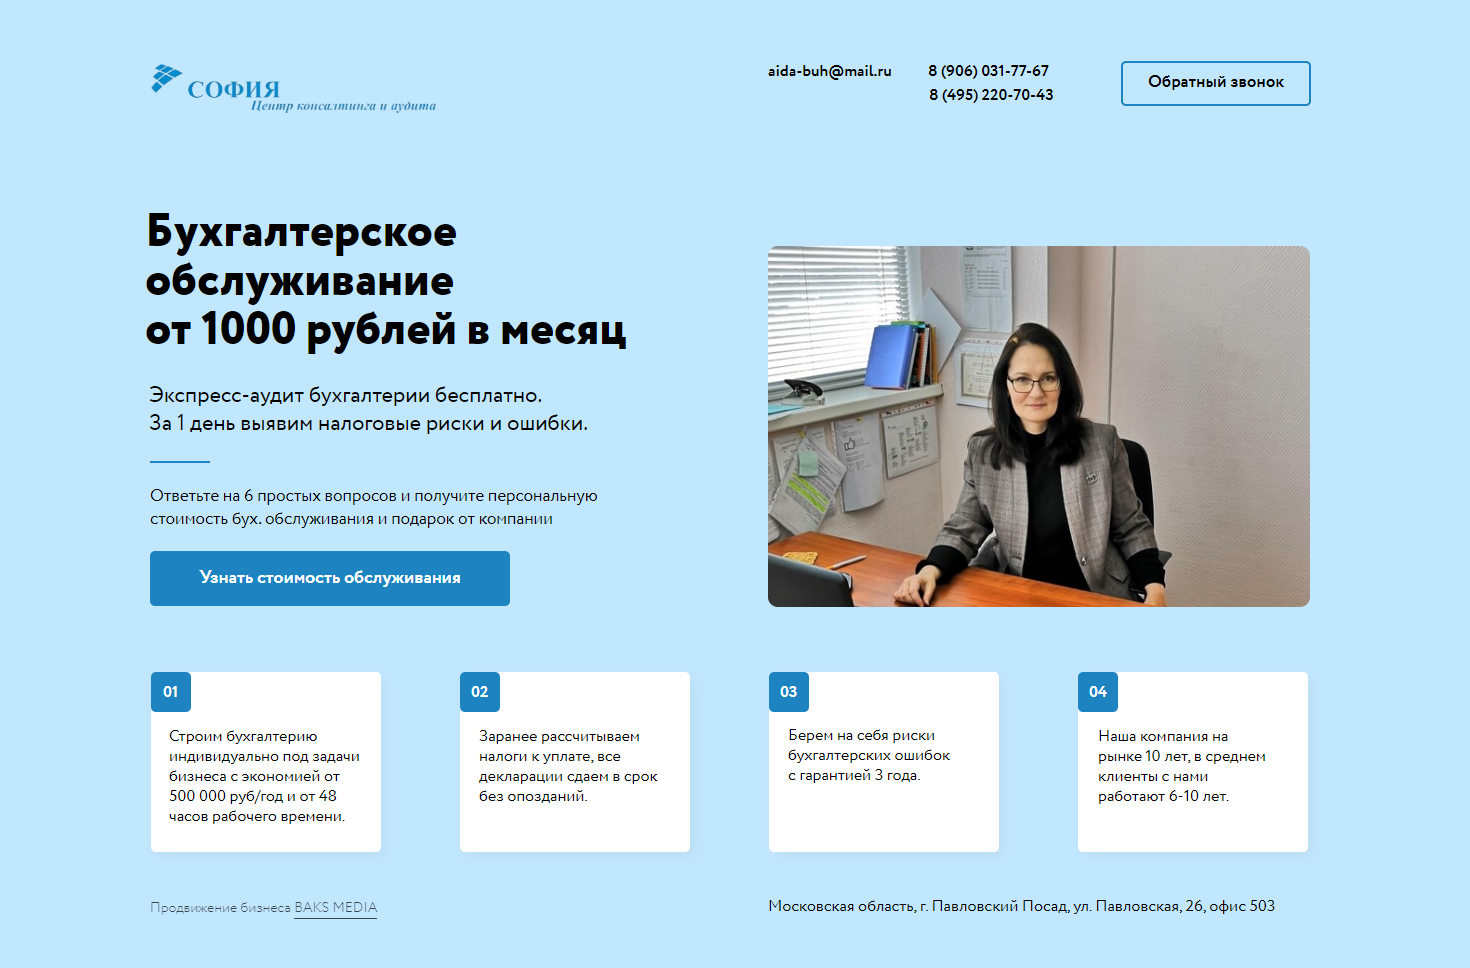 Центр бухгалтерских услуг и аудита календарь бухгалтера ооо 2021